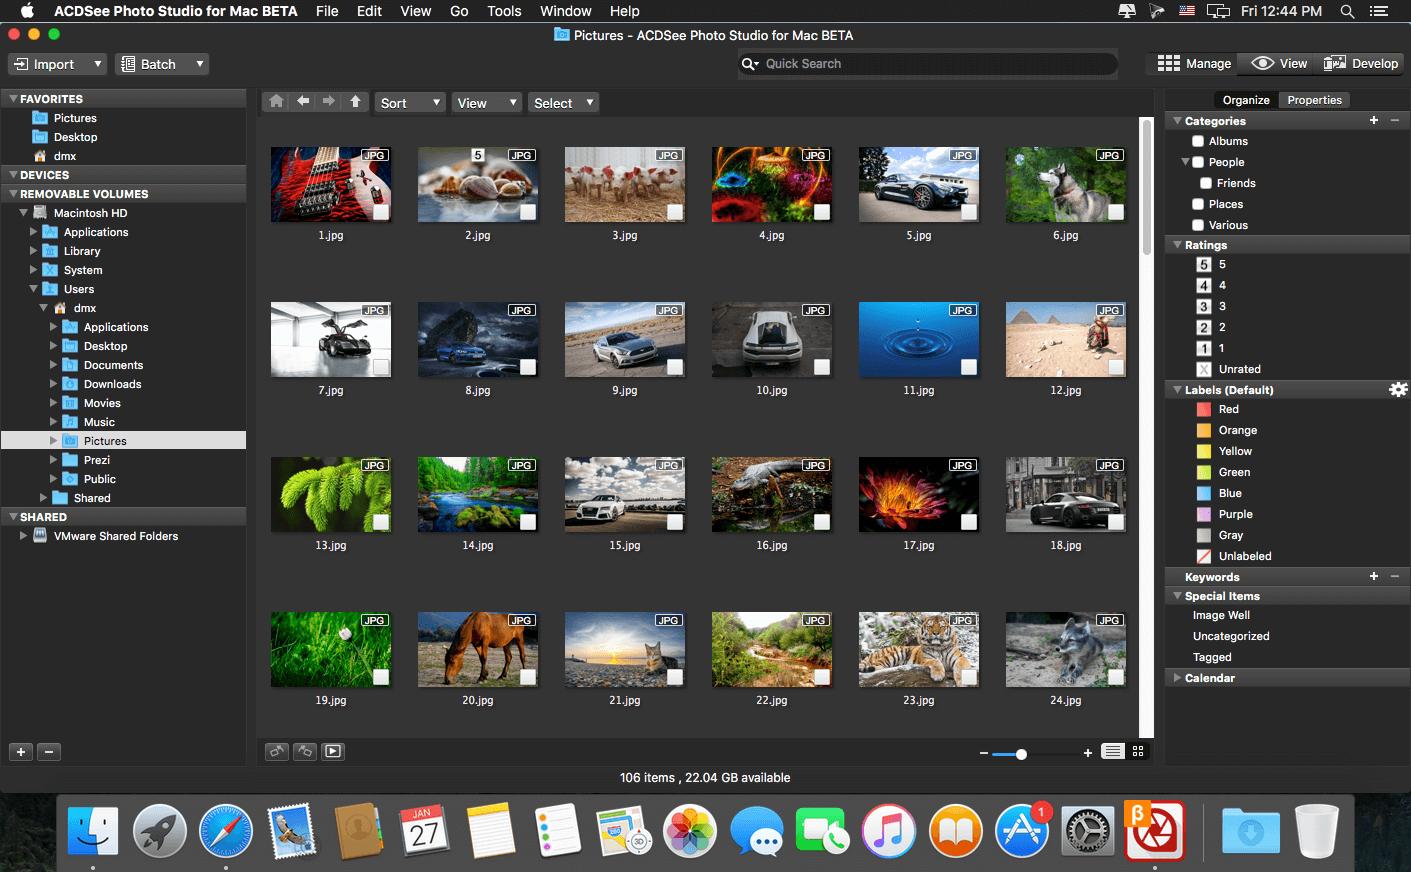 Best Mac photo editor - ACDSee Photo Studio